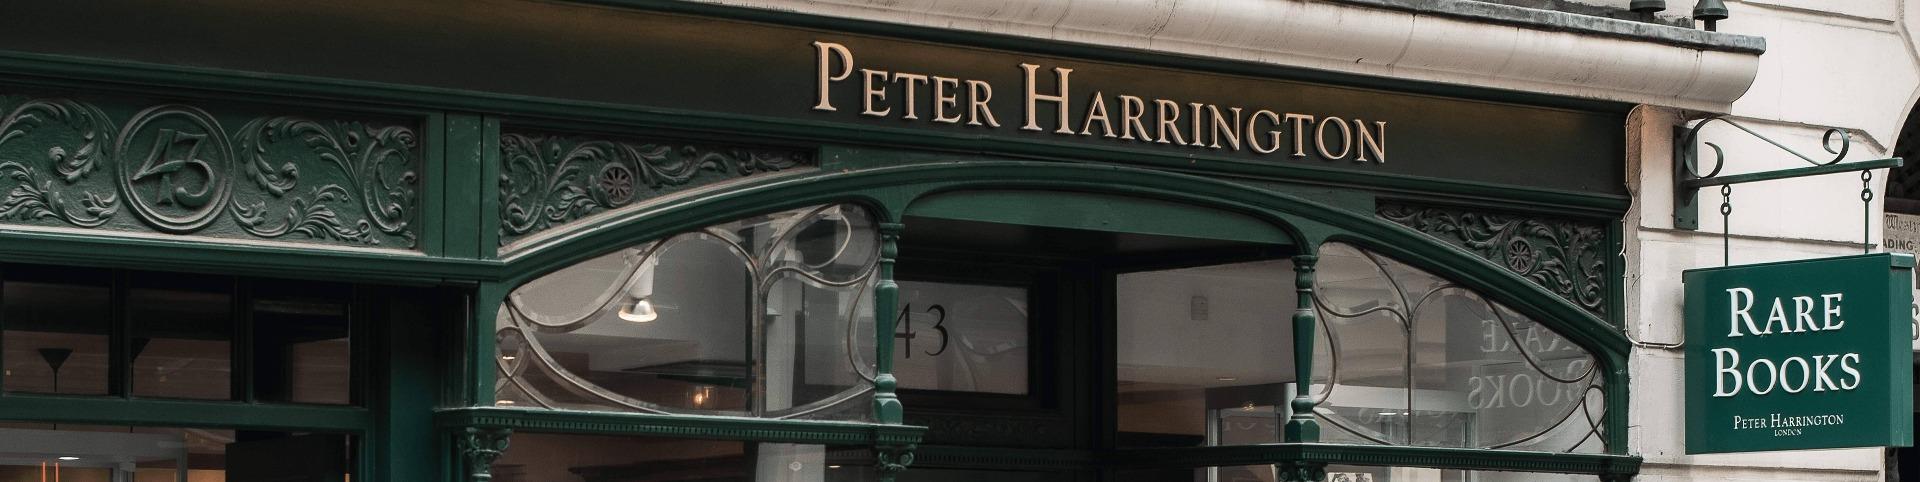 peter harrington shop banner